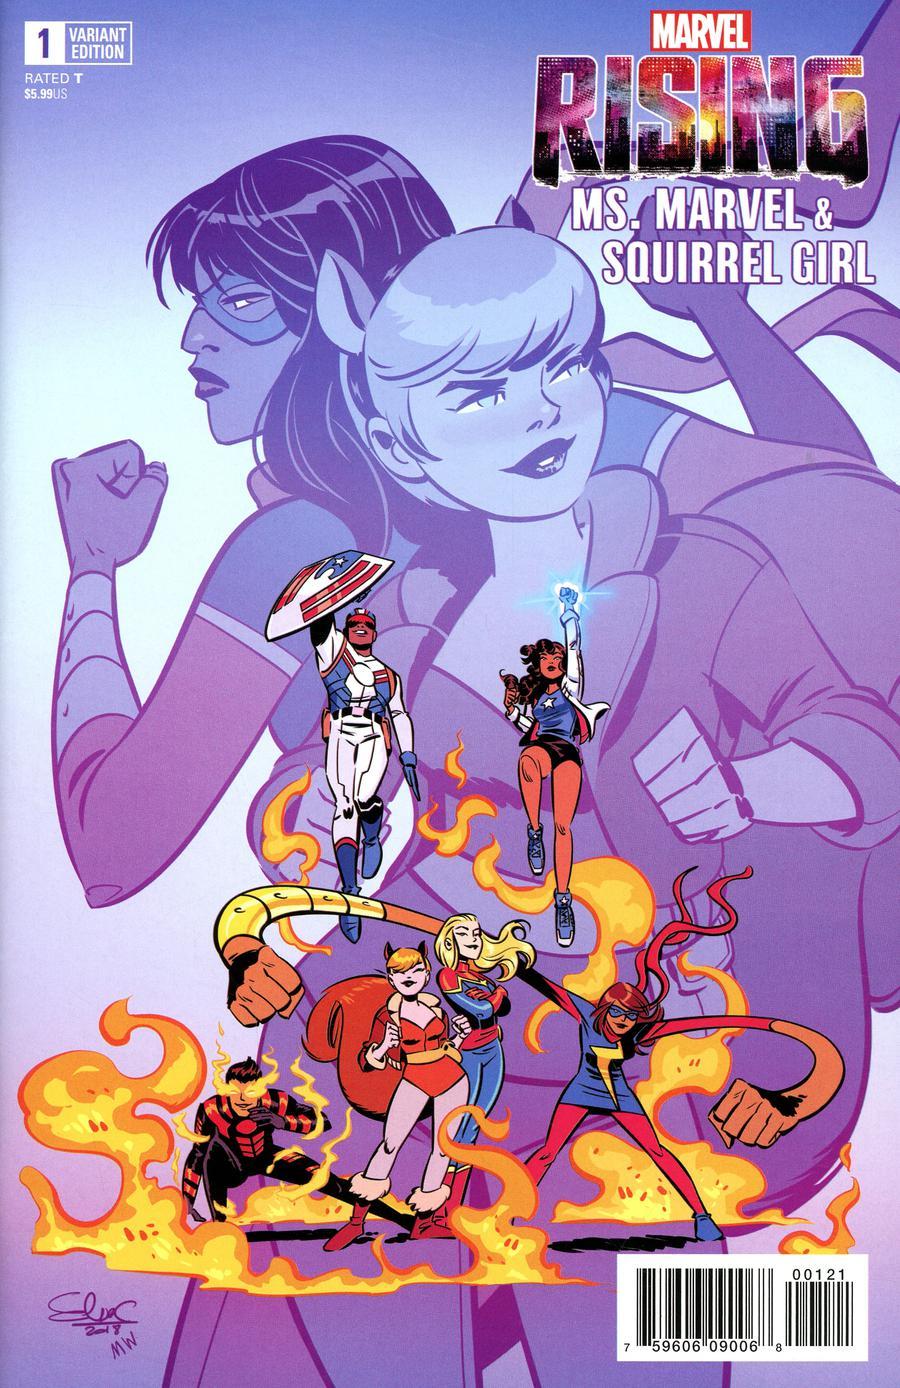 Marvel Rising Ms Marvel Squirrel Girl #1 Cover B Variant Elsa Charretier Cover